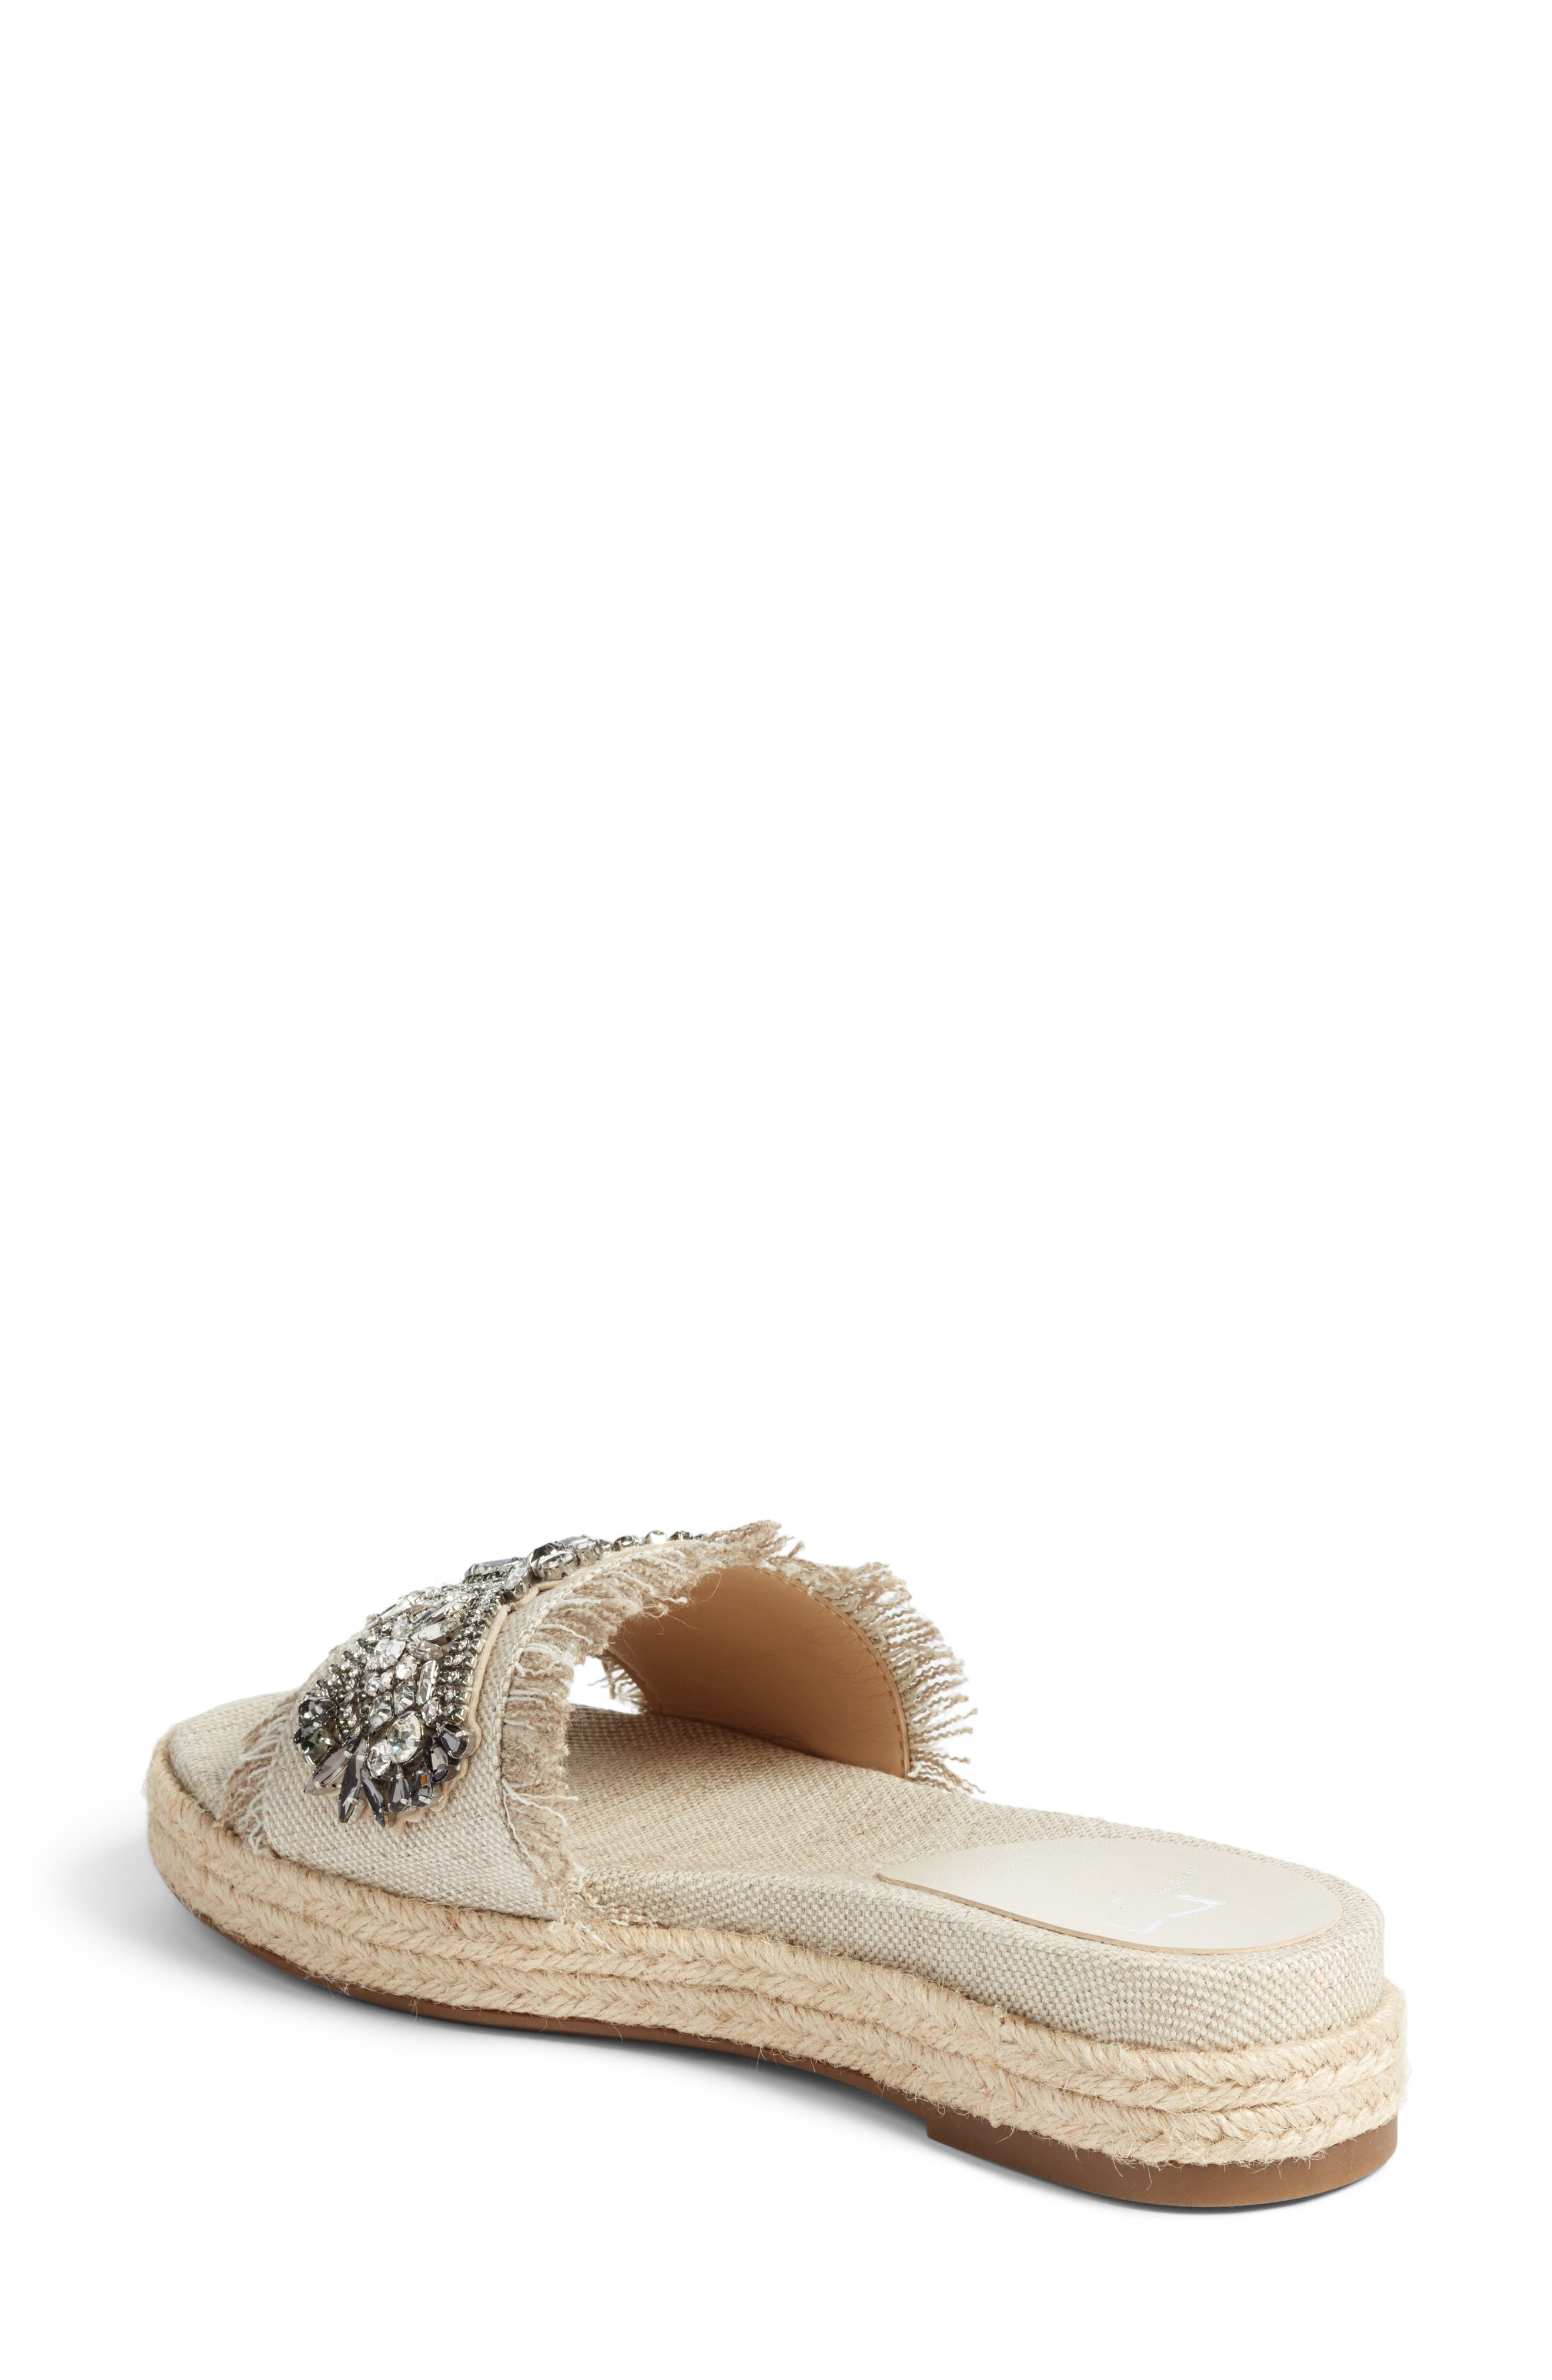 Jelly II Embellished Sandal,                             Alternate thumbnail 3, color,